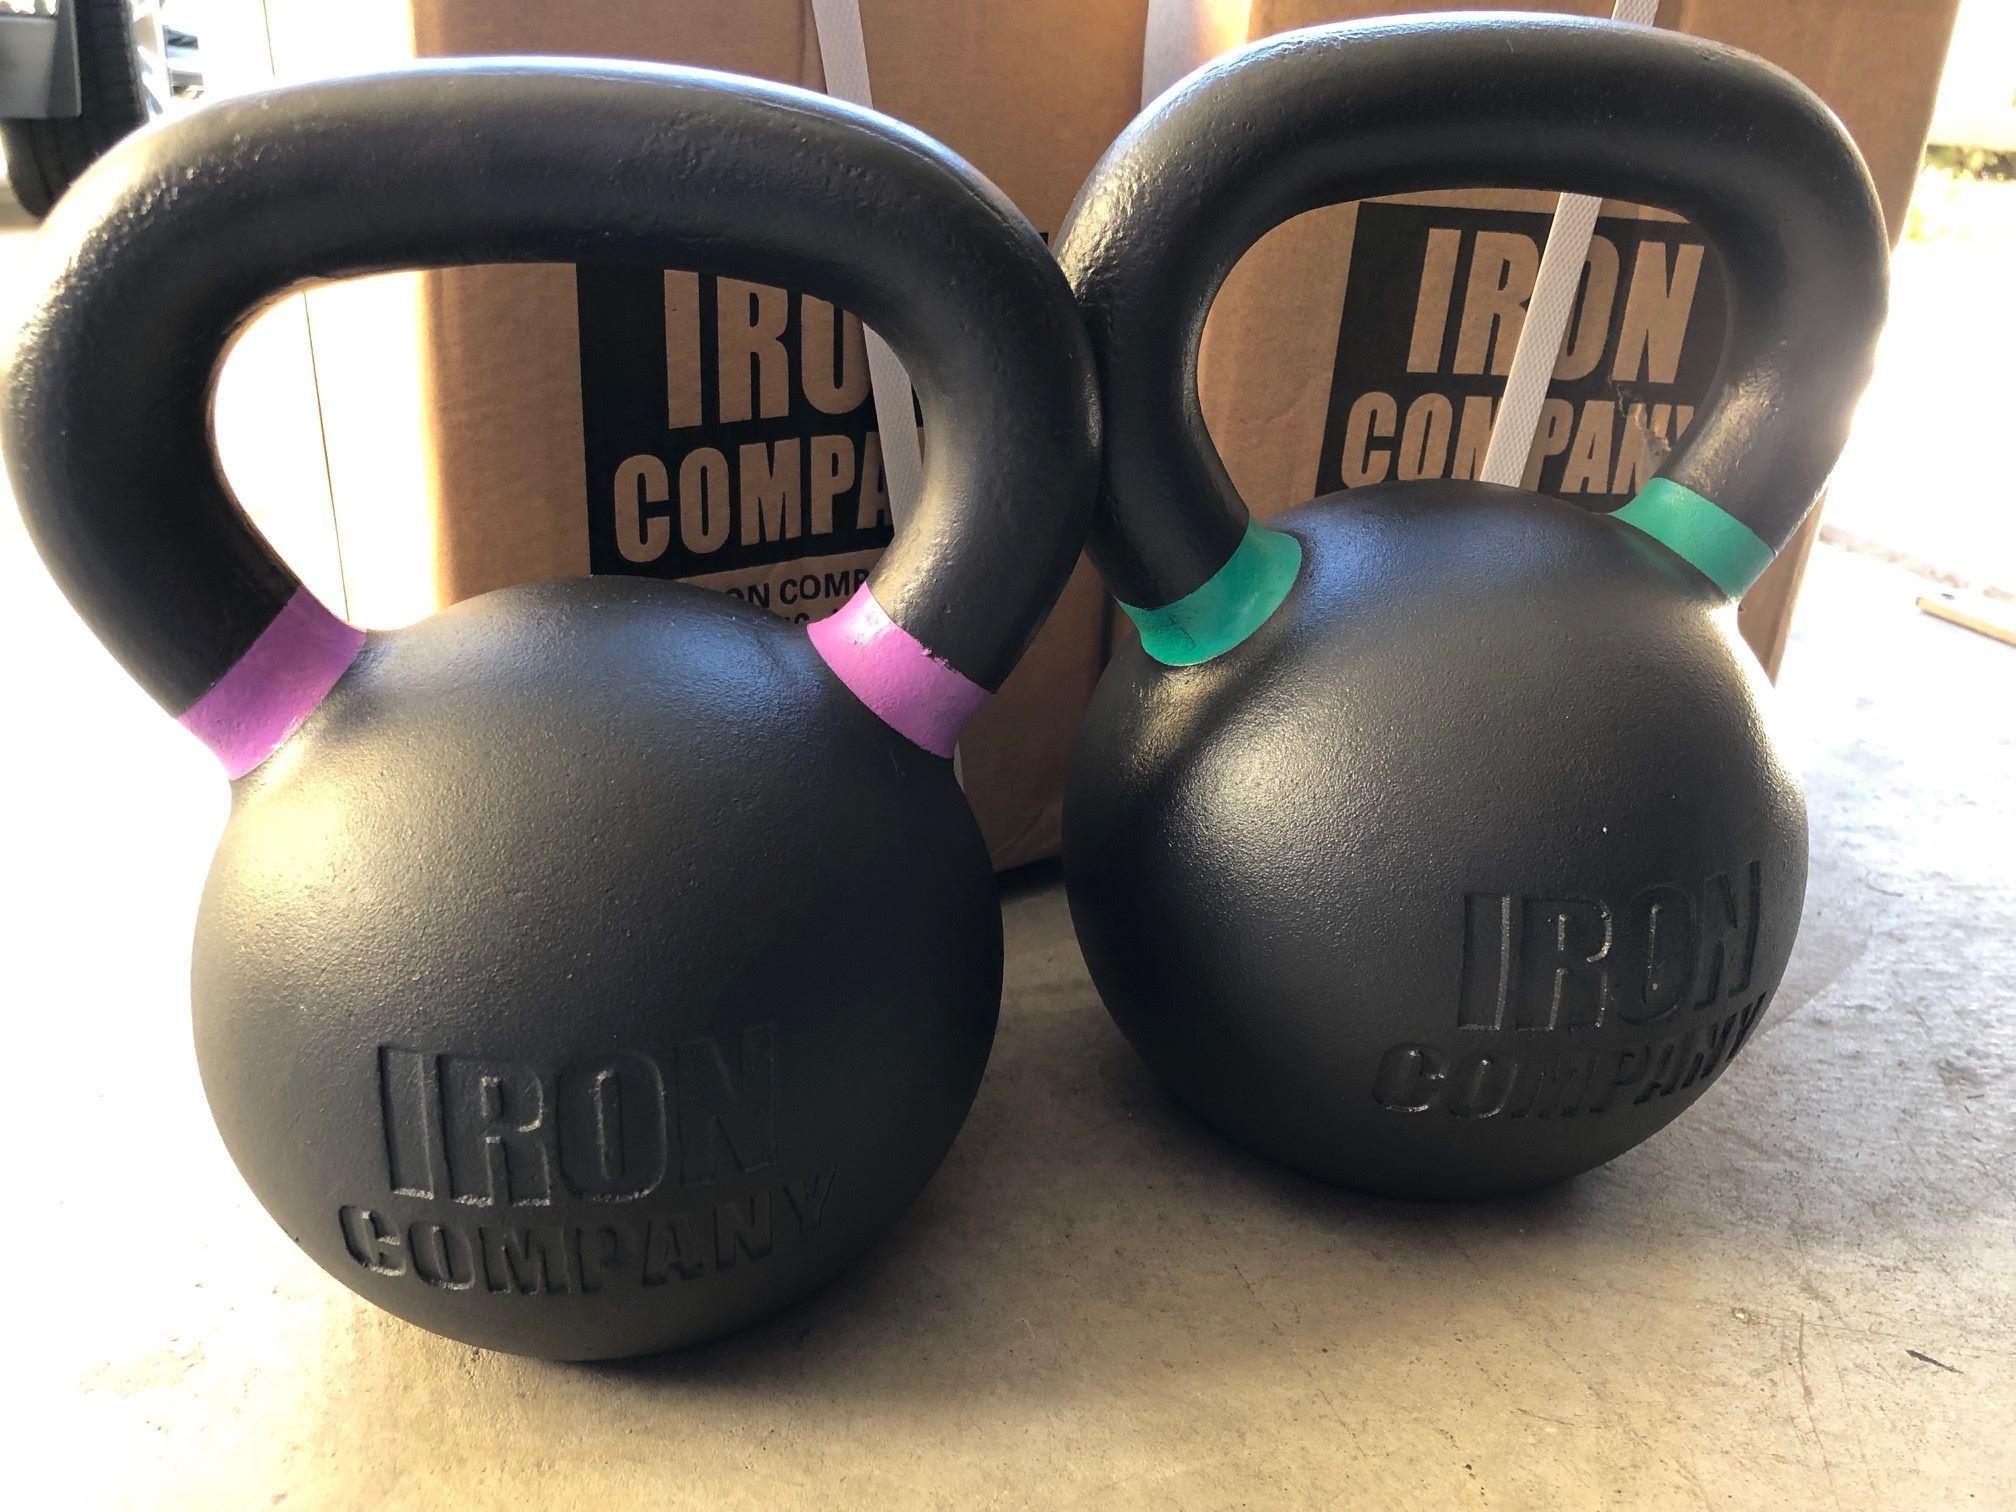 IRON COMPANY Powder Coated Kettlebells